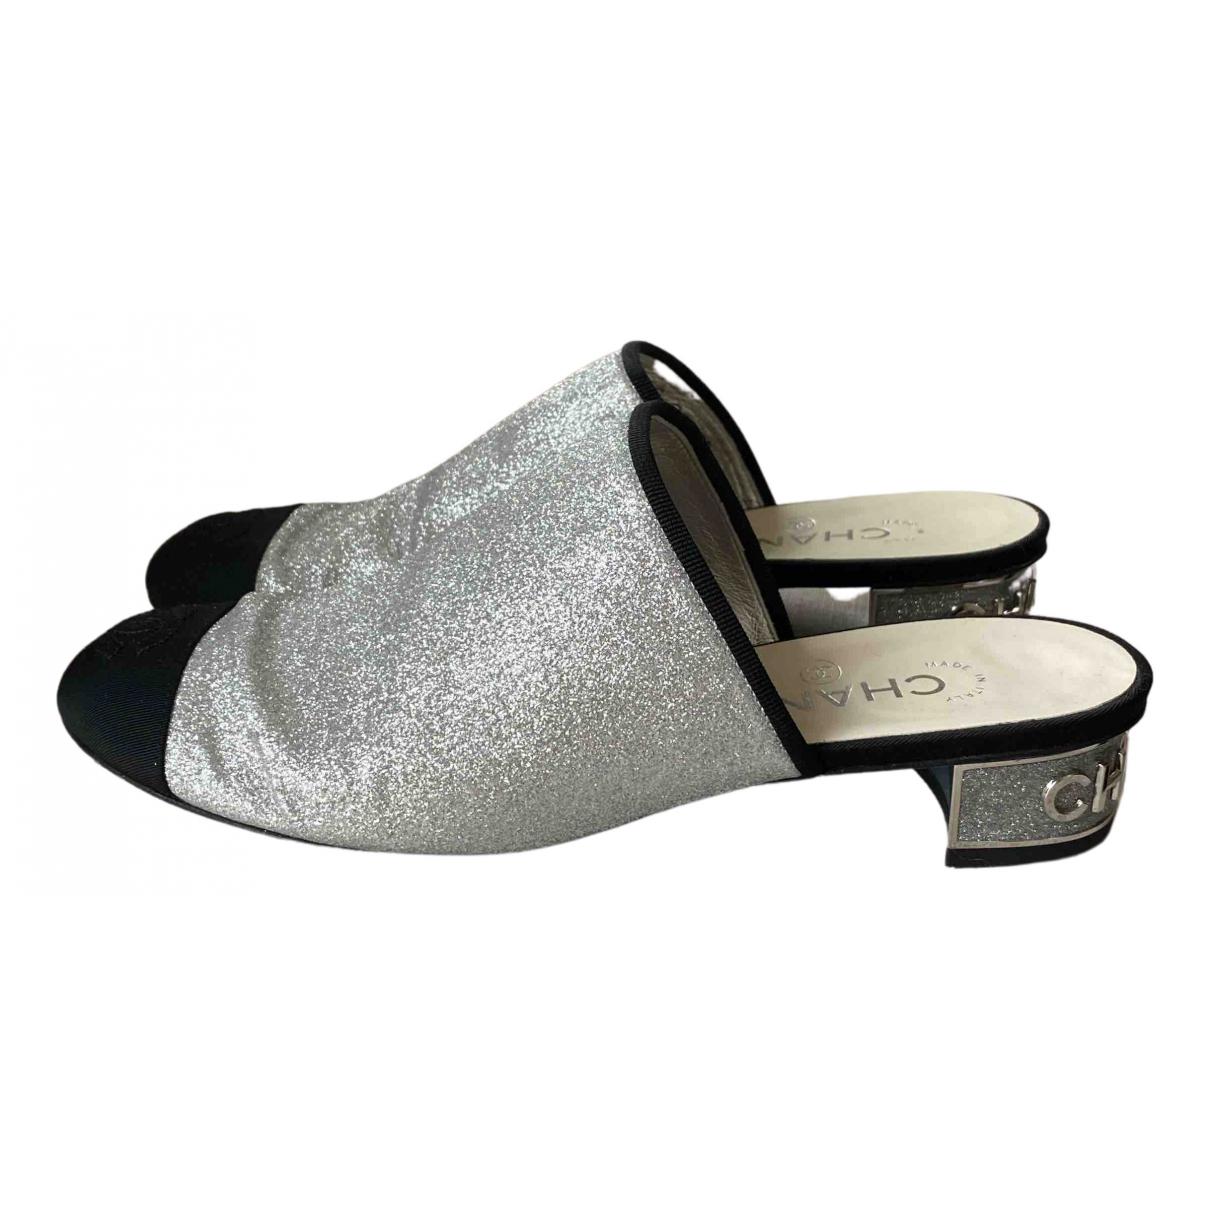 Chanel N Silver Glitter Mules & Clogs for Women 38.5 EU